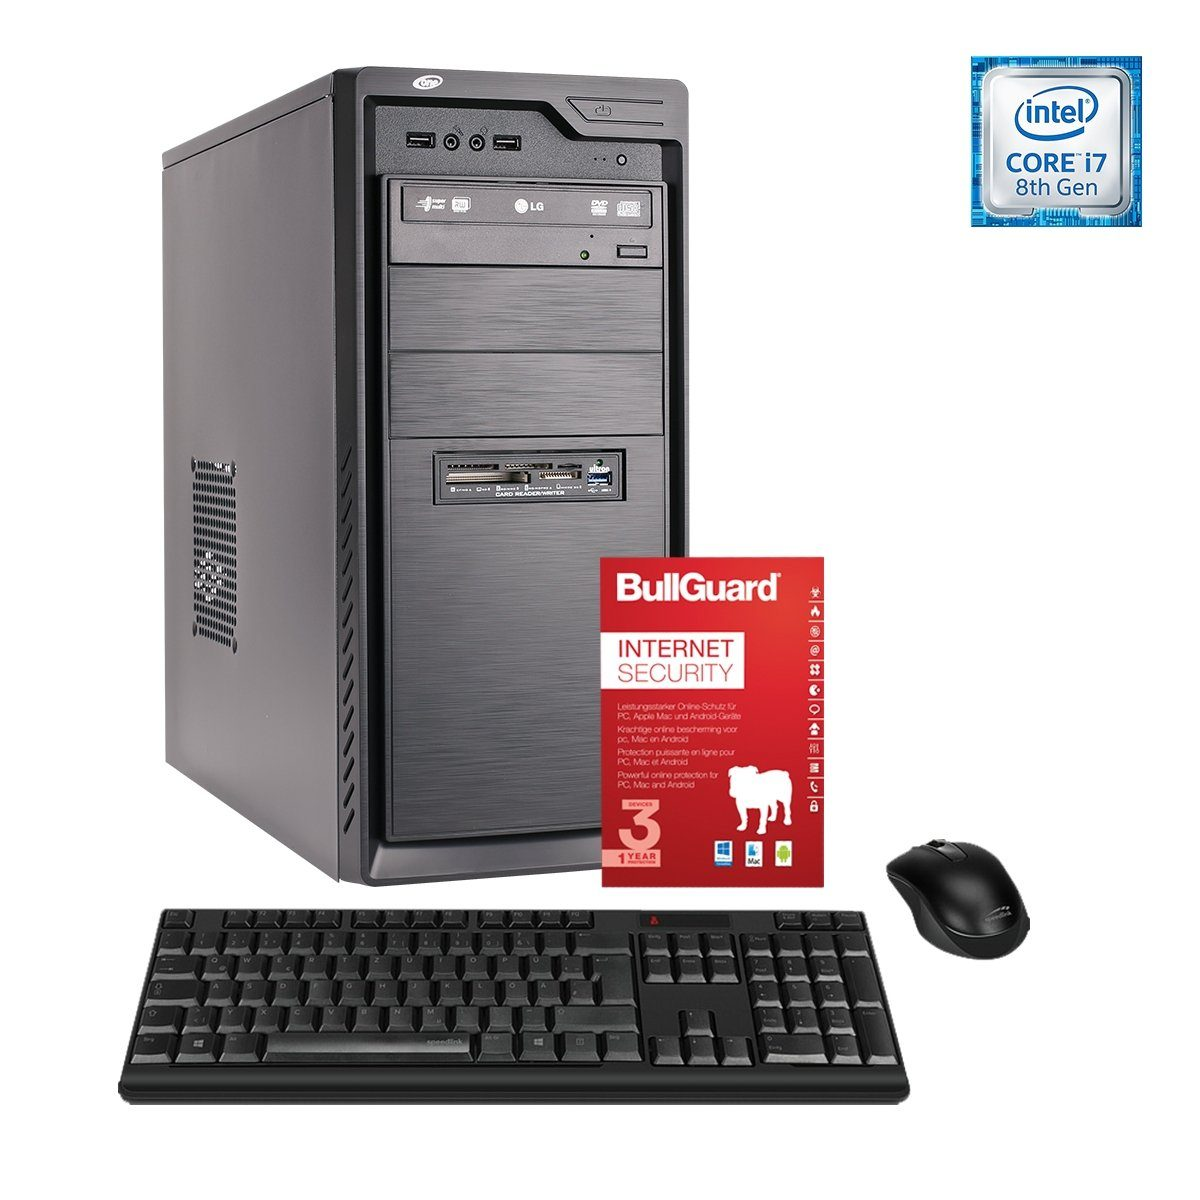 ONE PC, Core™ i7-8700, GeForce GTX 1060, 16GB »Office PC 130214«